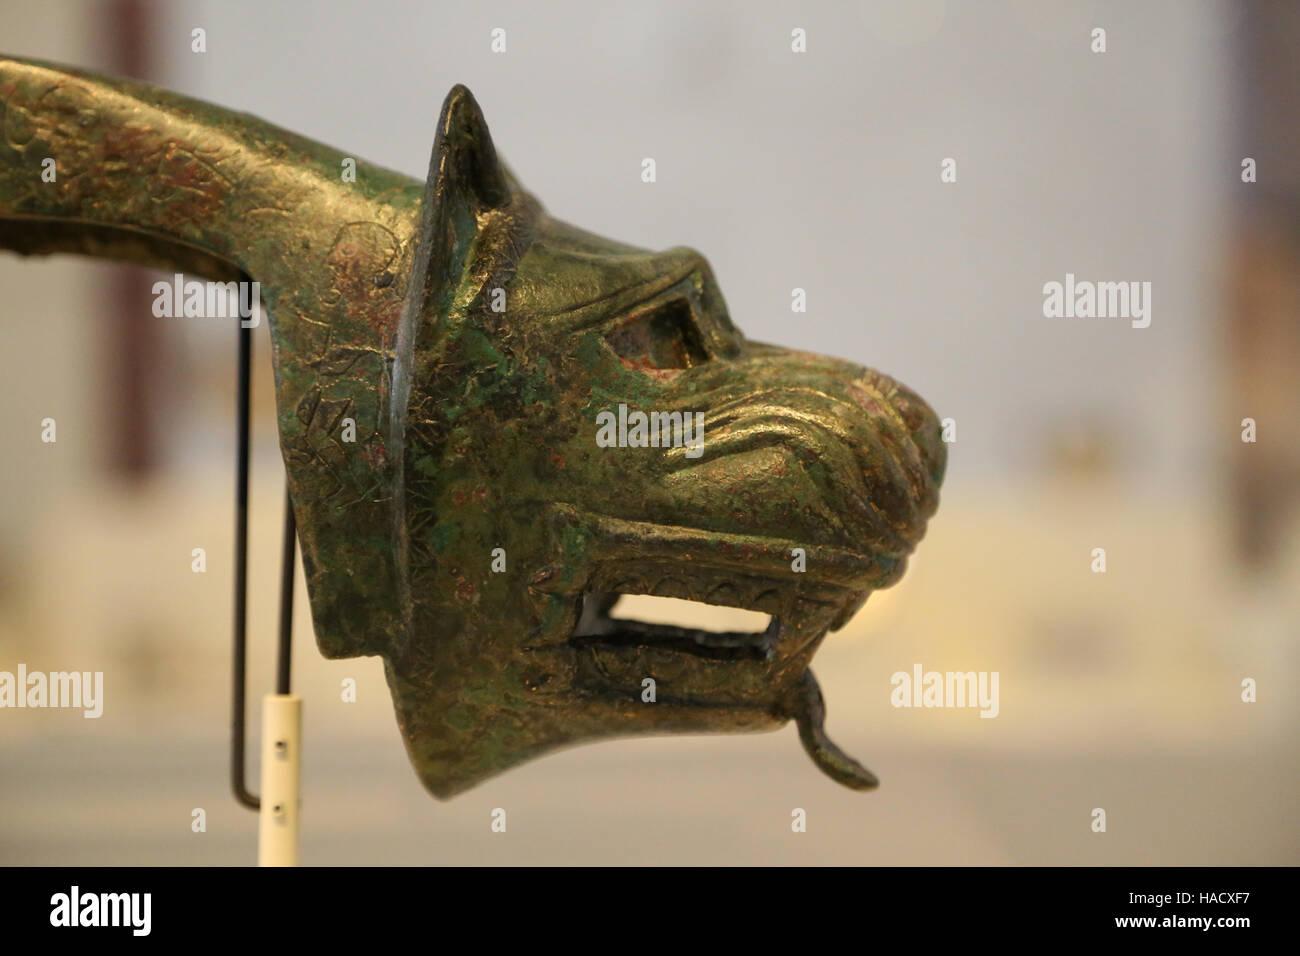 Yoke appliques. Bronze. Iberian culture. 4th century BC. Mengibar, Jaen. National Archaeological Museum, Madrid. - Stock Image